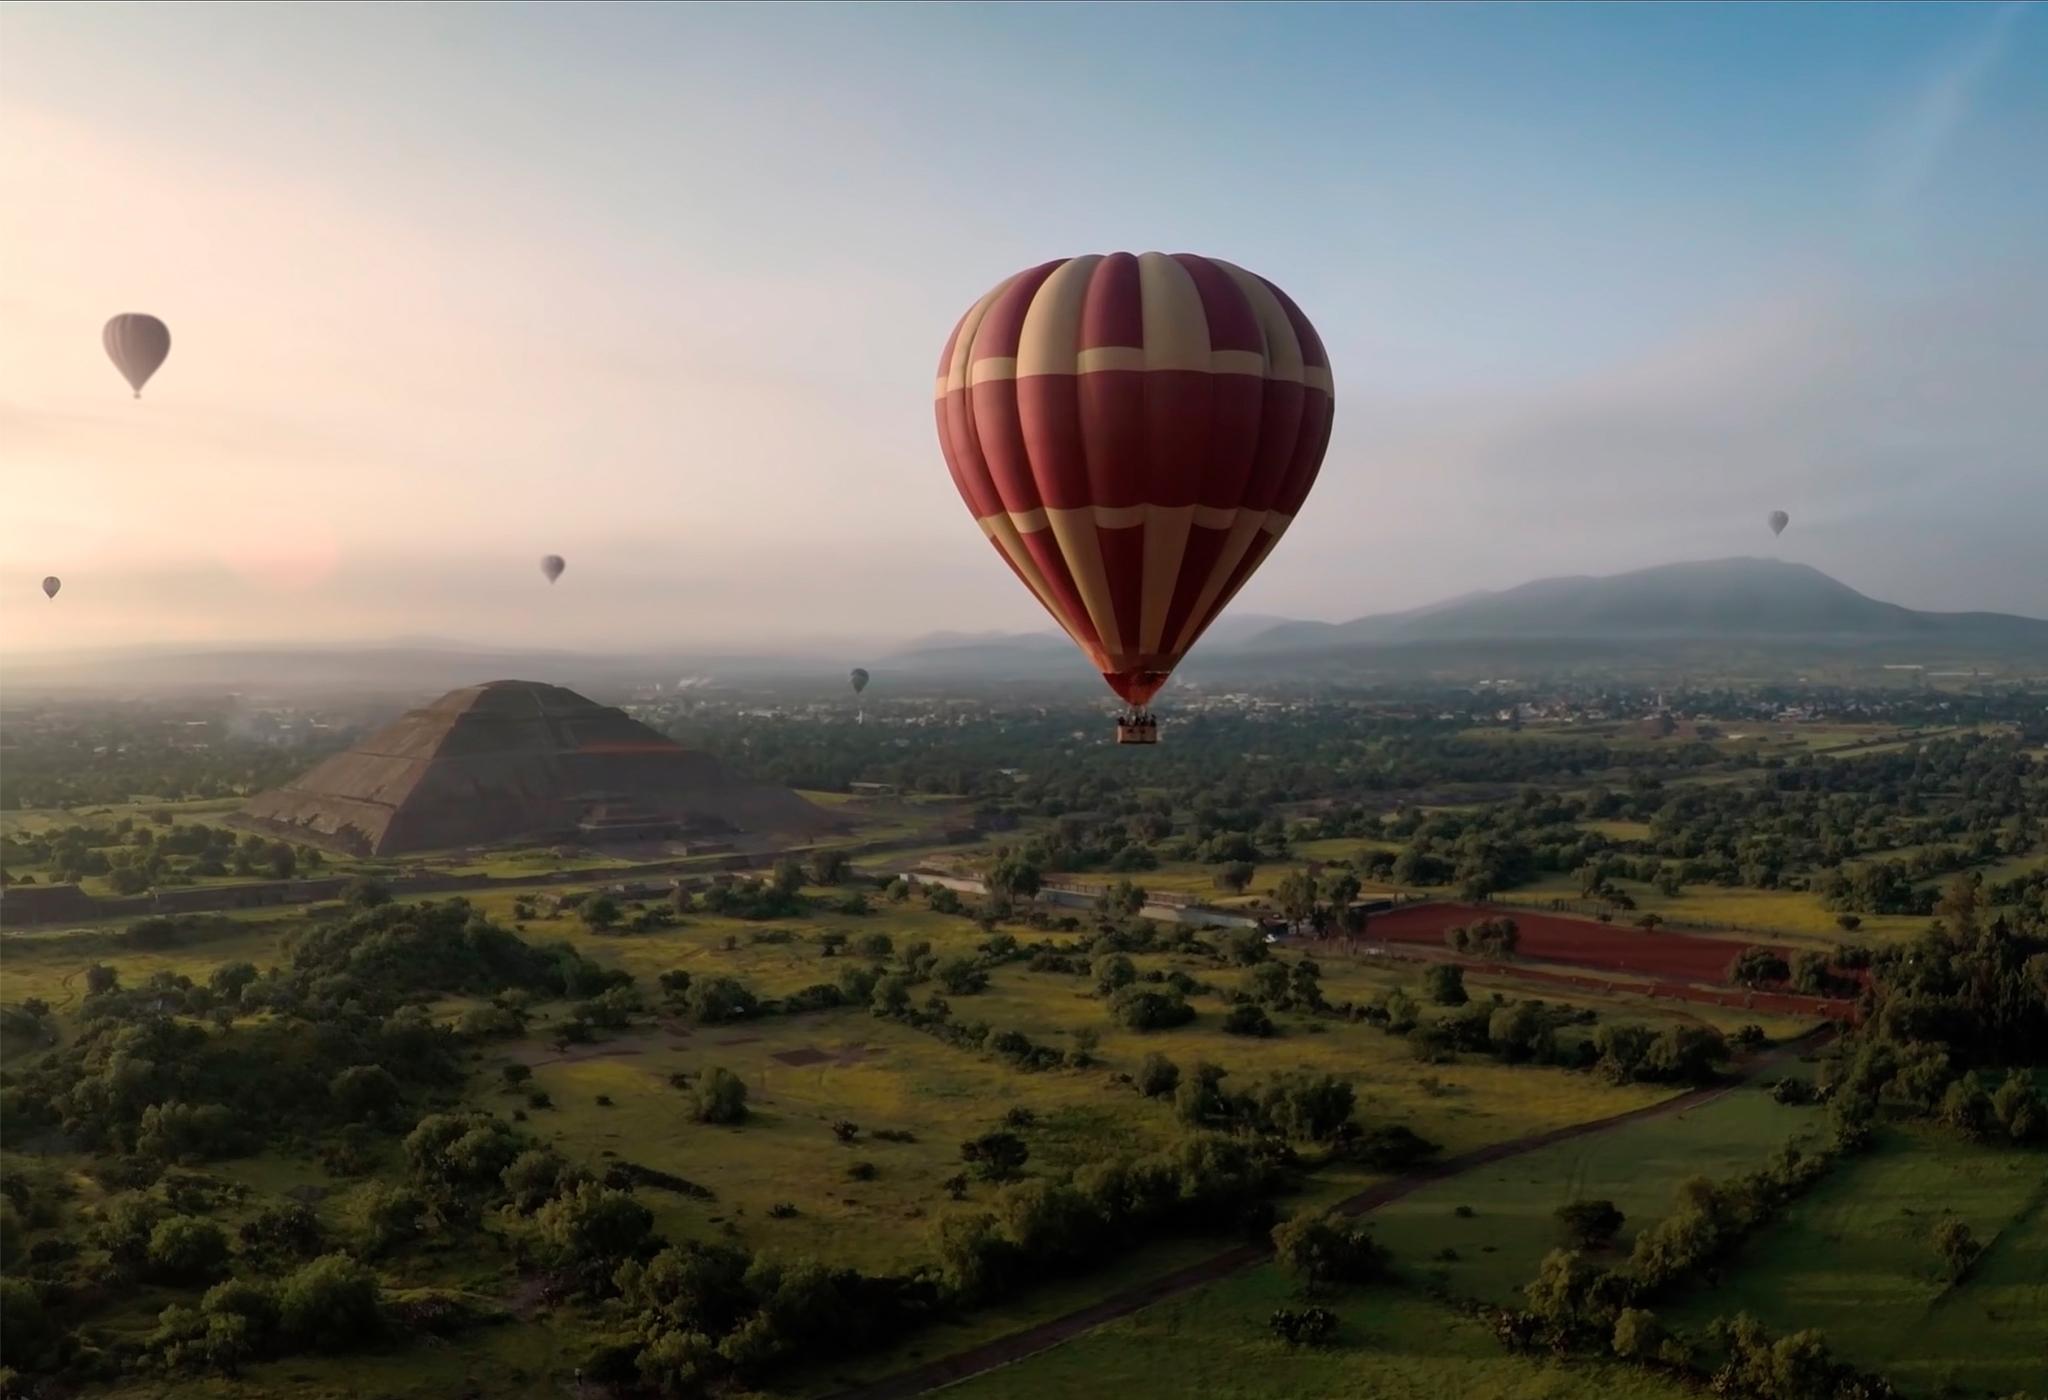 Vuelo en globo en Teotihuacán